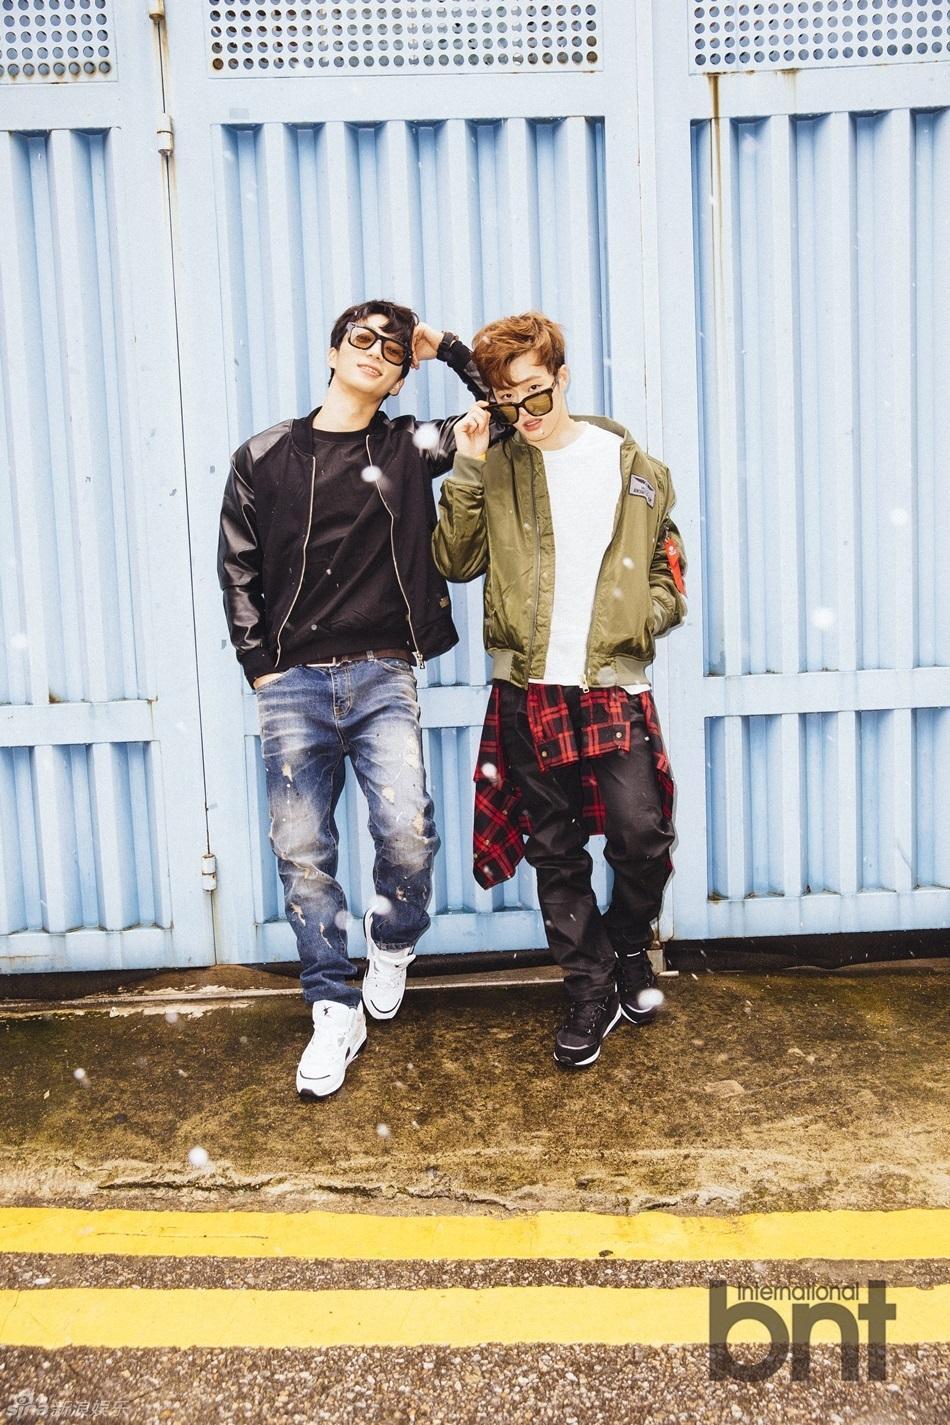 BIGSTAR成员Feeldog、来桓携手bntnews拍摄了一组时尚写真,飞